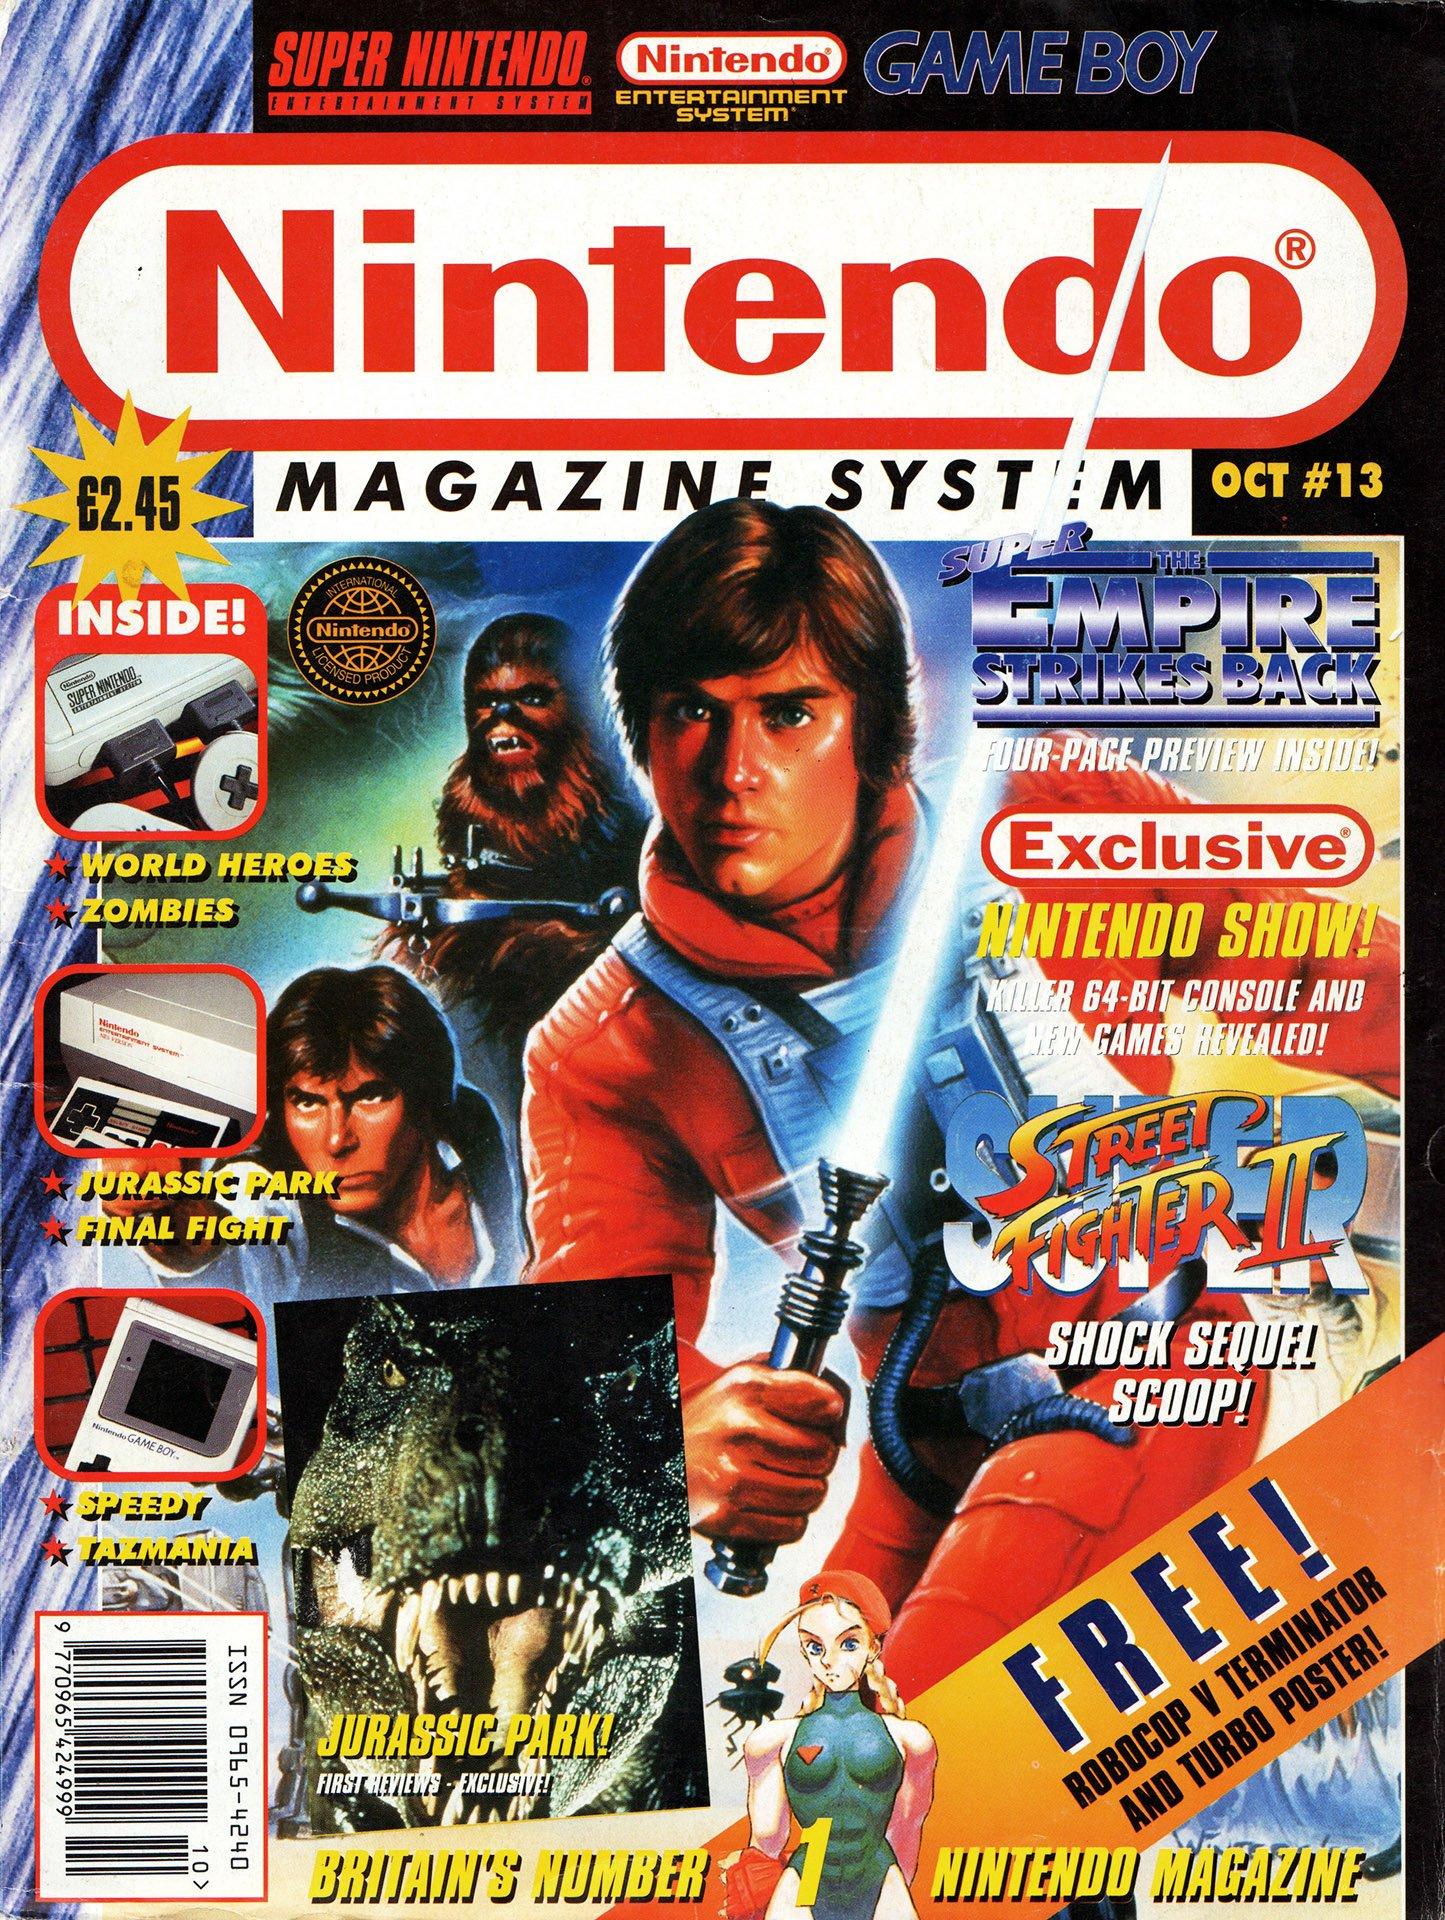 Nintendo Magazine System 013 (October 1993)